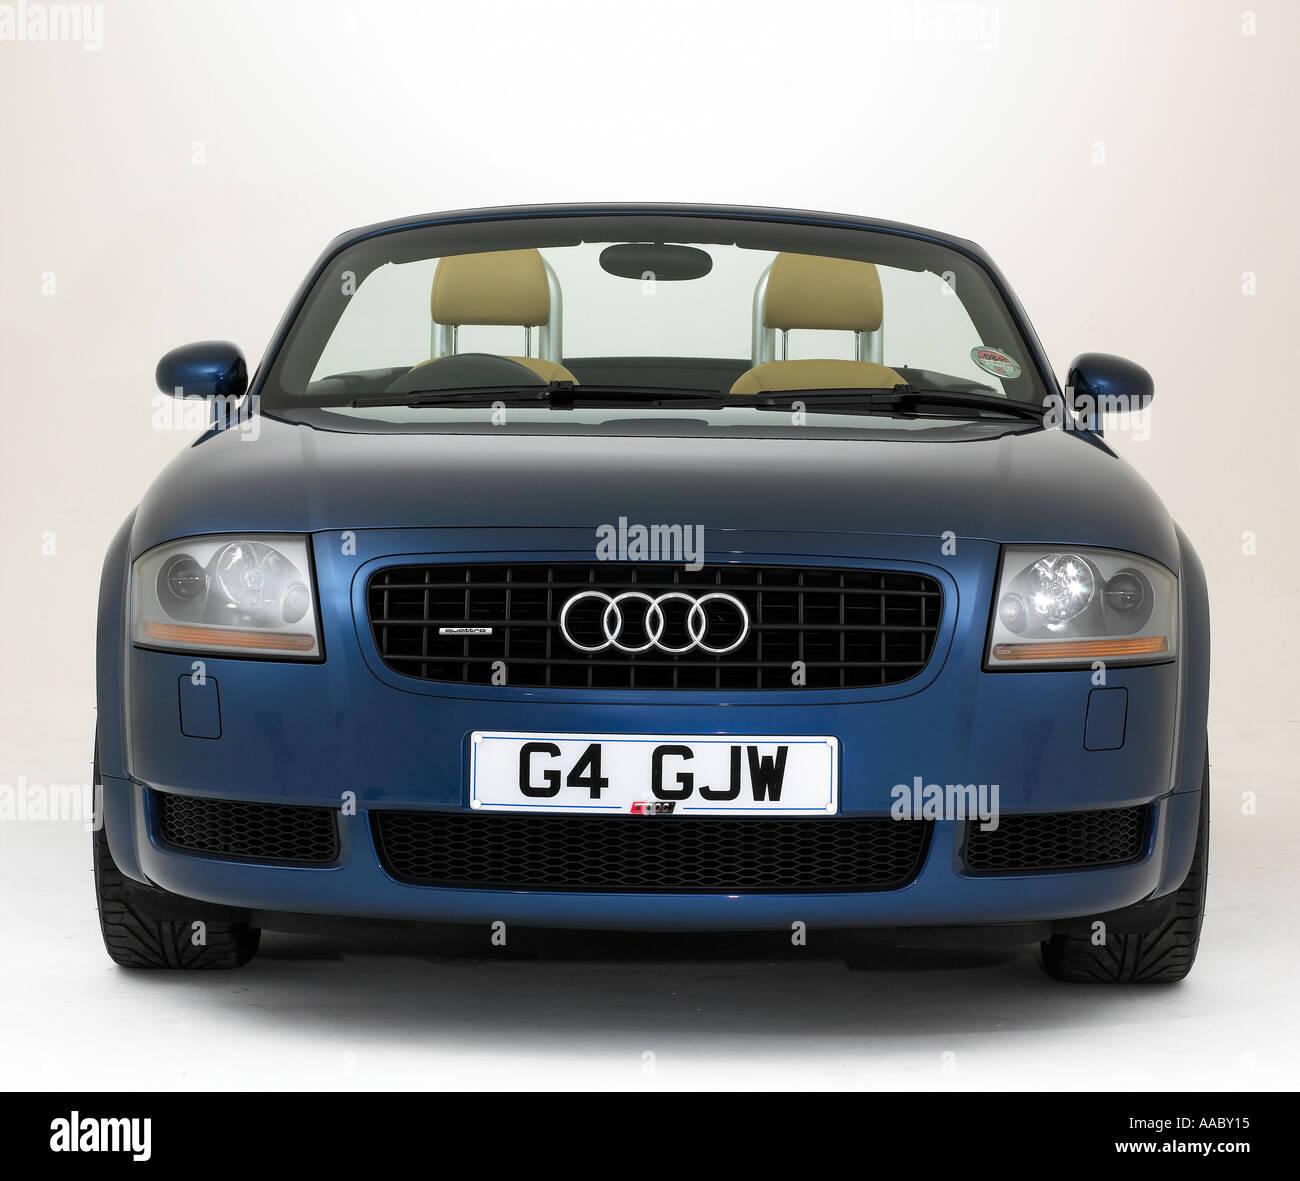 2003 Audi TT Roadster Stock Photo